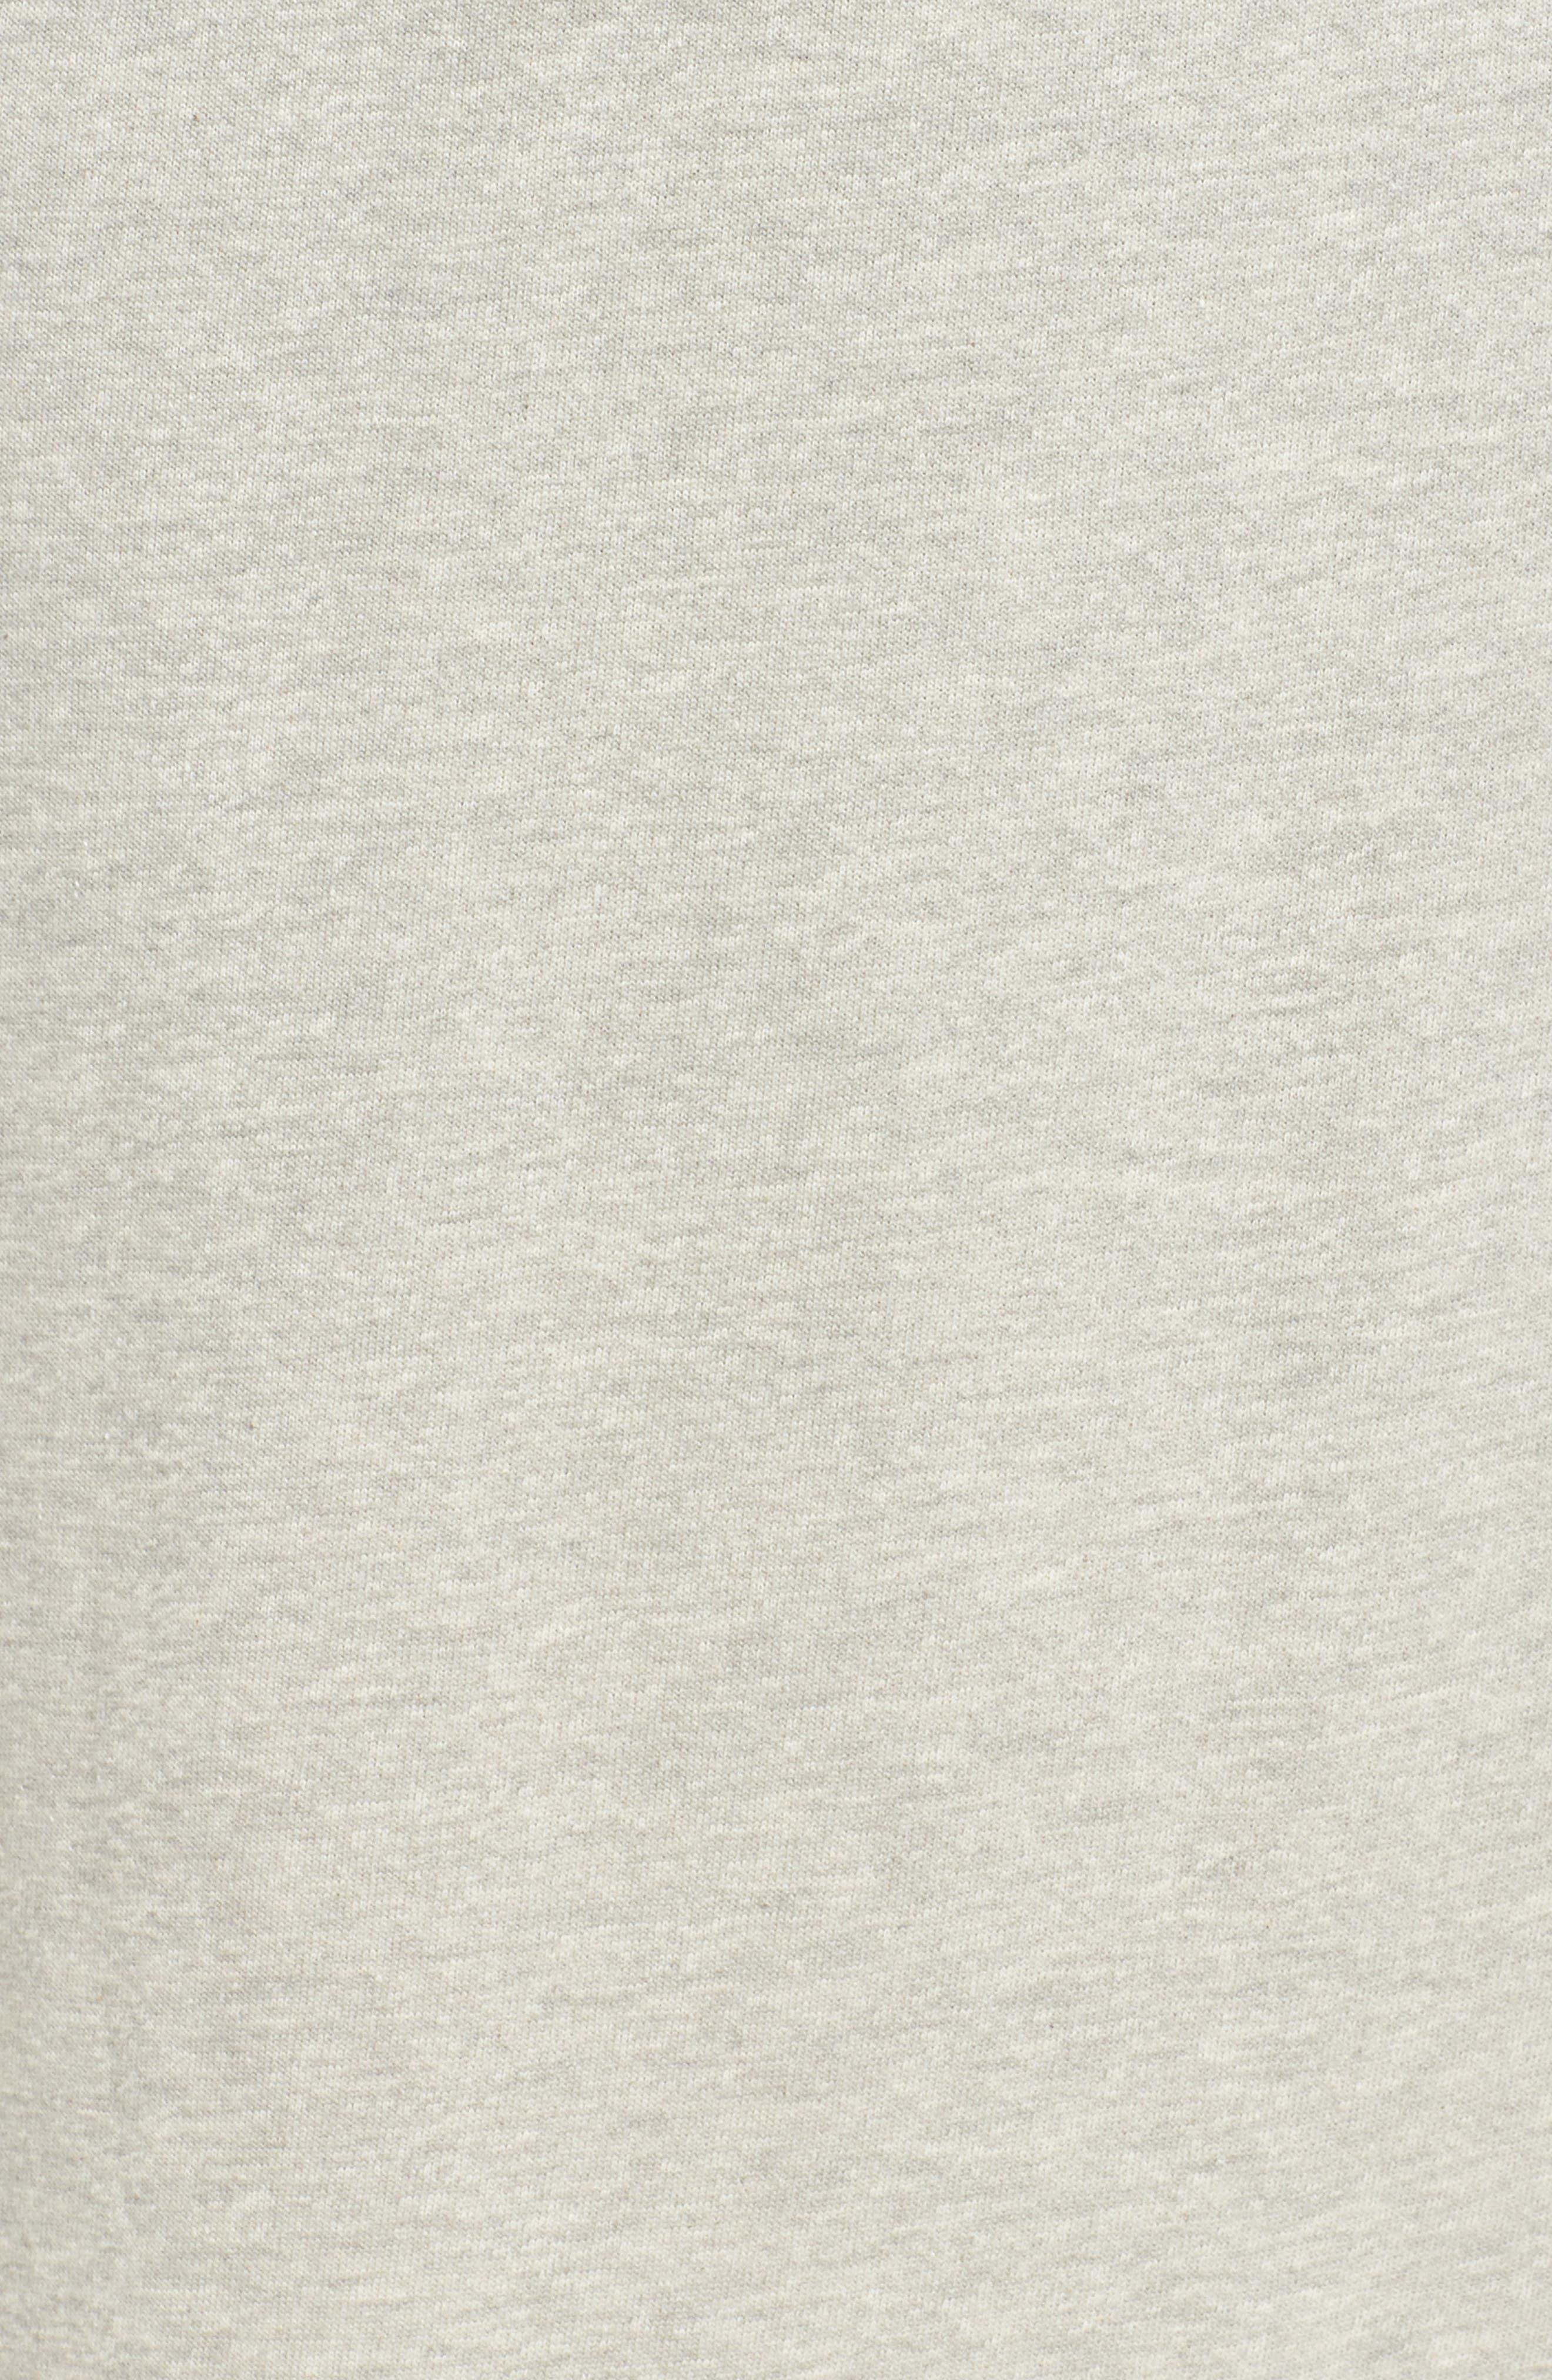 Drawstring Knit Skirt,                             Alternate thumbnail 6, color,                             Grey Heather